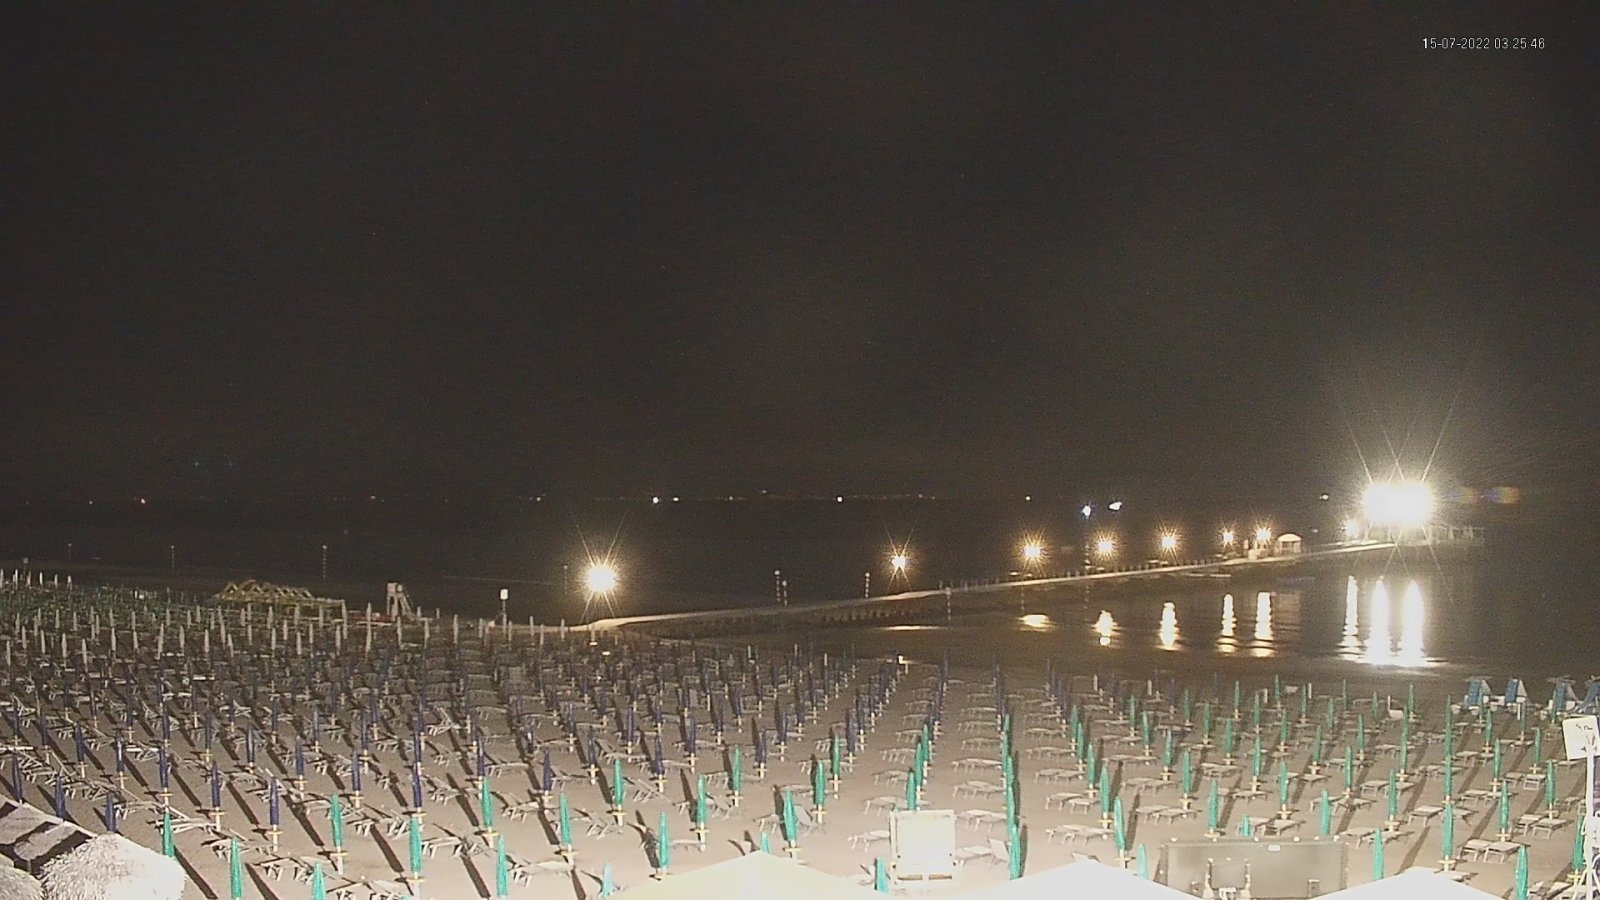 webkamera lignano pineta, webcamera lignano pineta, webkamera lignano, webcamera lignano, lignano pineta, lignano pláž, pláž lignano pineta